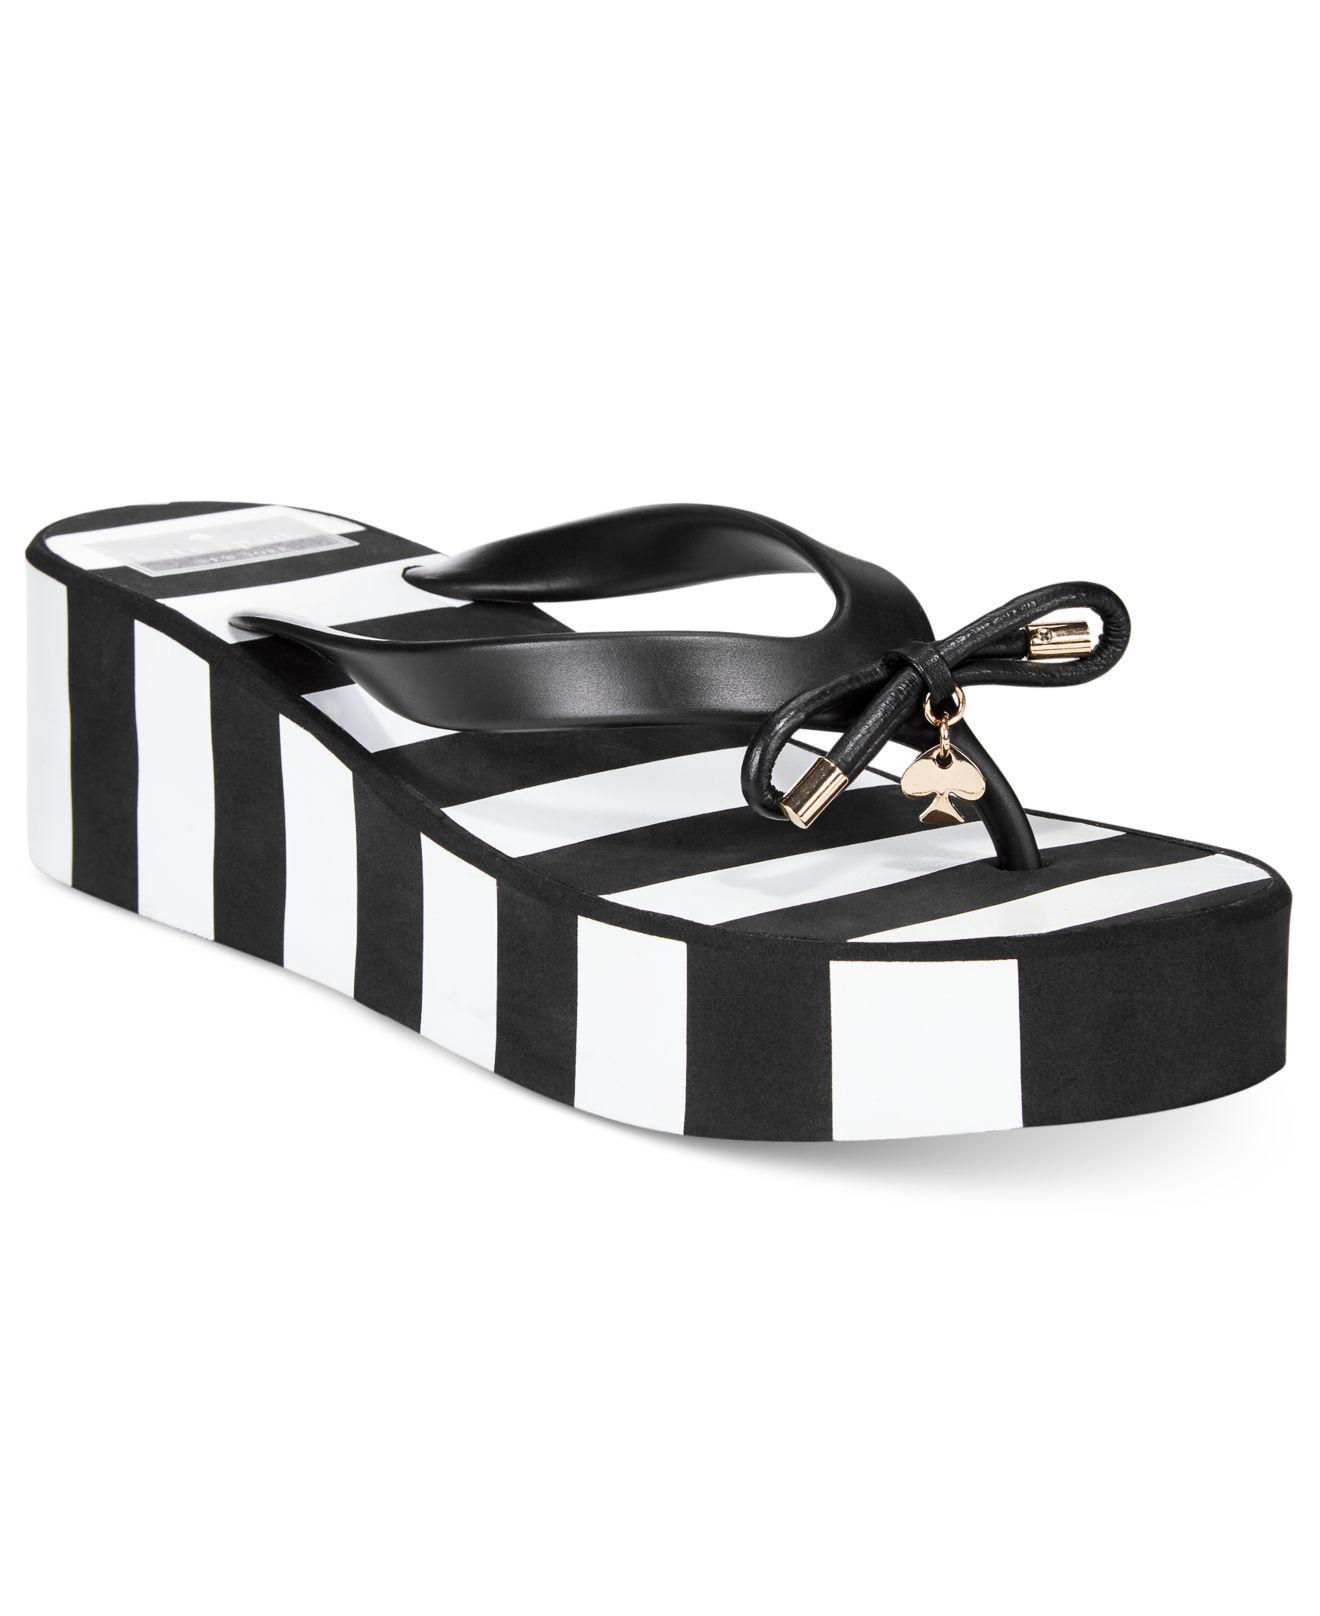 b2f026a1321 Lyst - Kate Spade Rhett Striped Wedge Sandals in Black